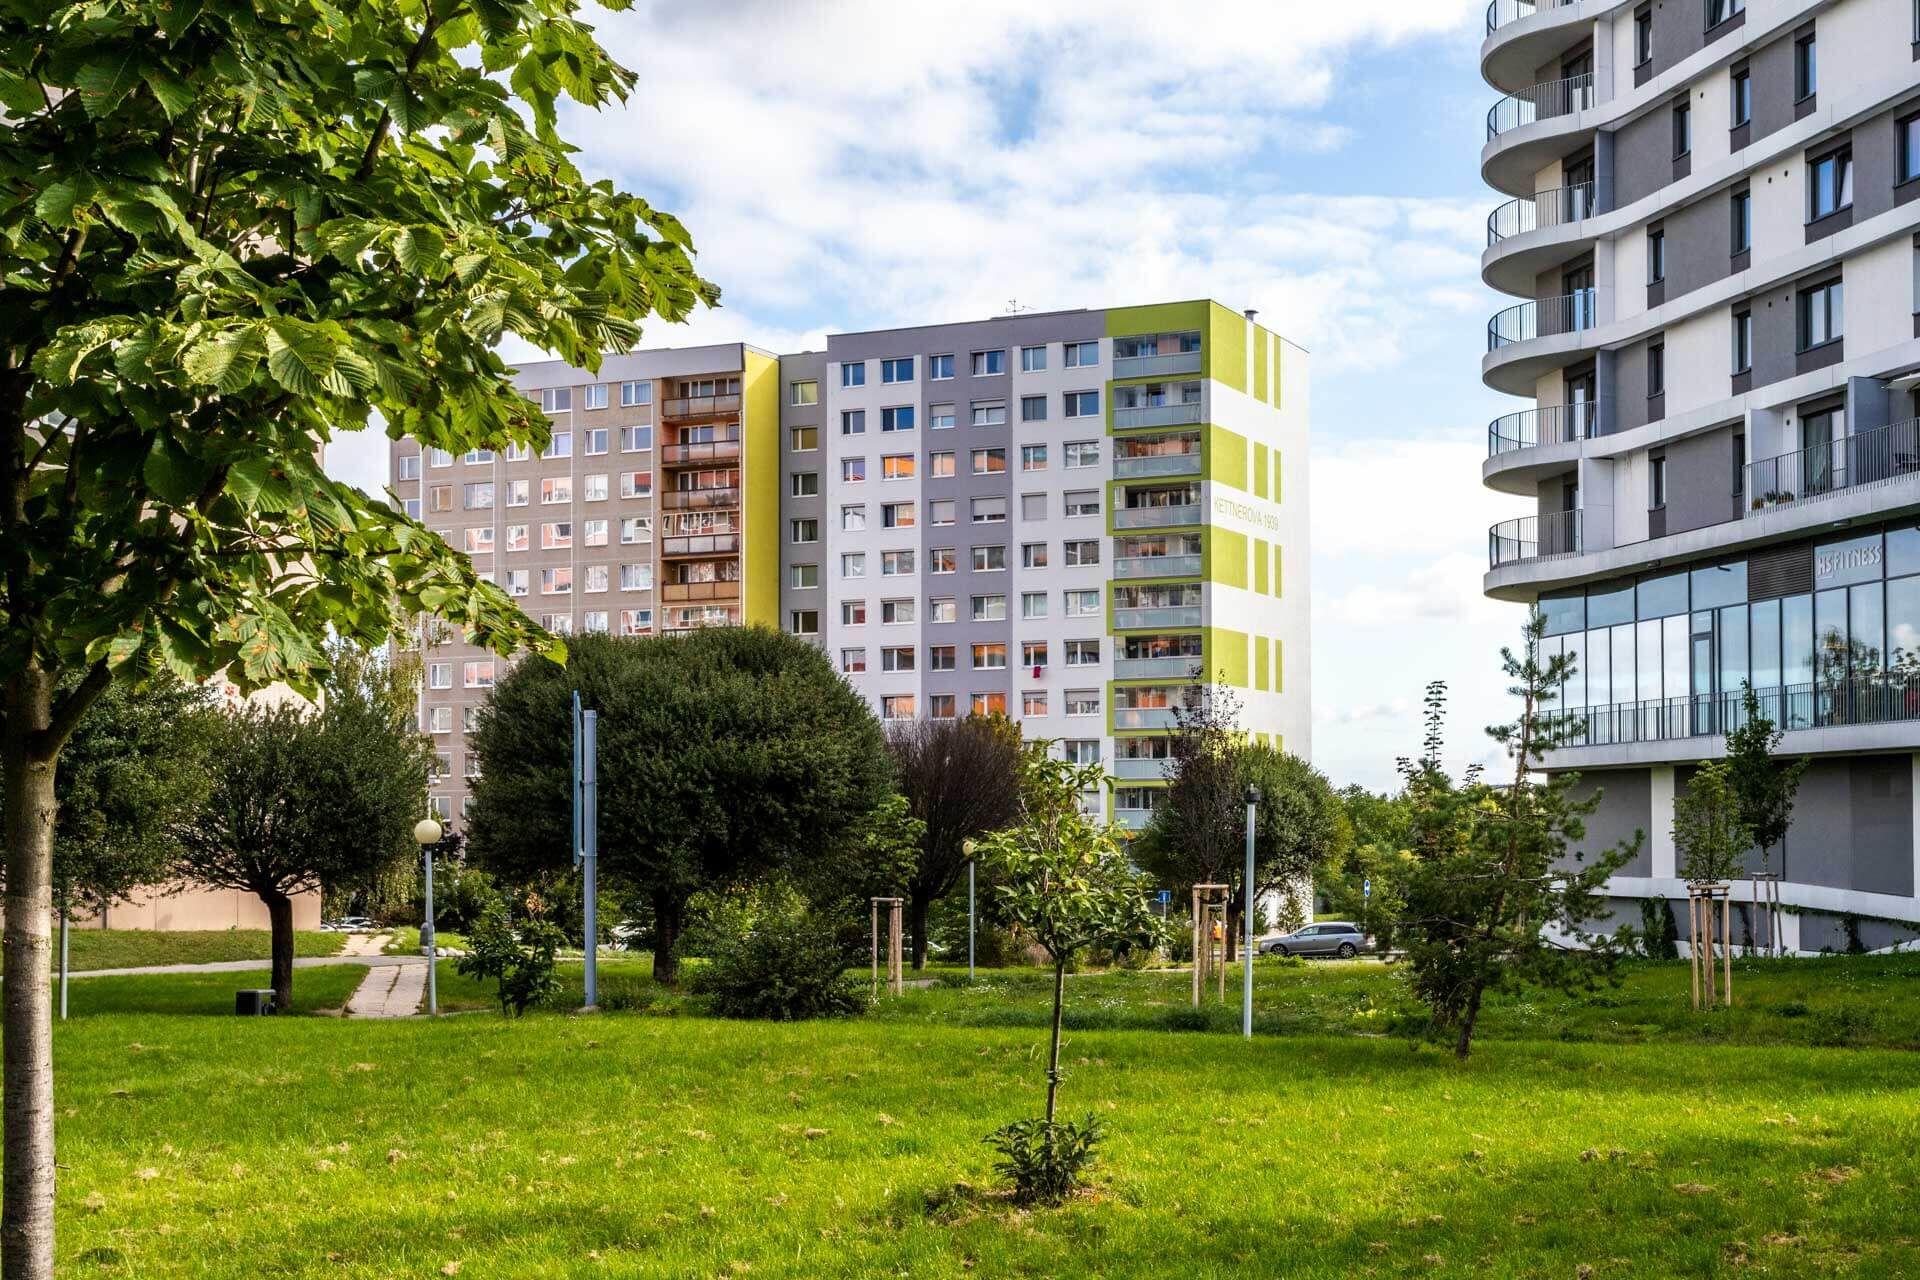 Prodej bytu 2+kk - 43 m², Praha 5 - Stodůlky